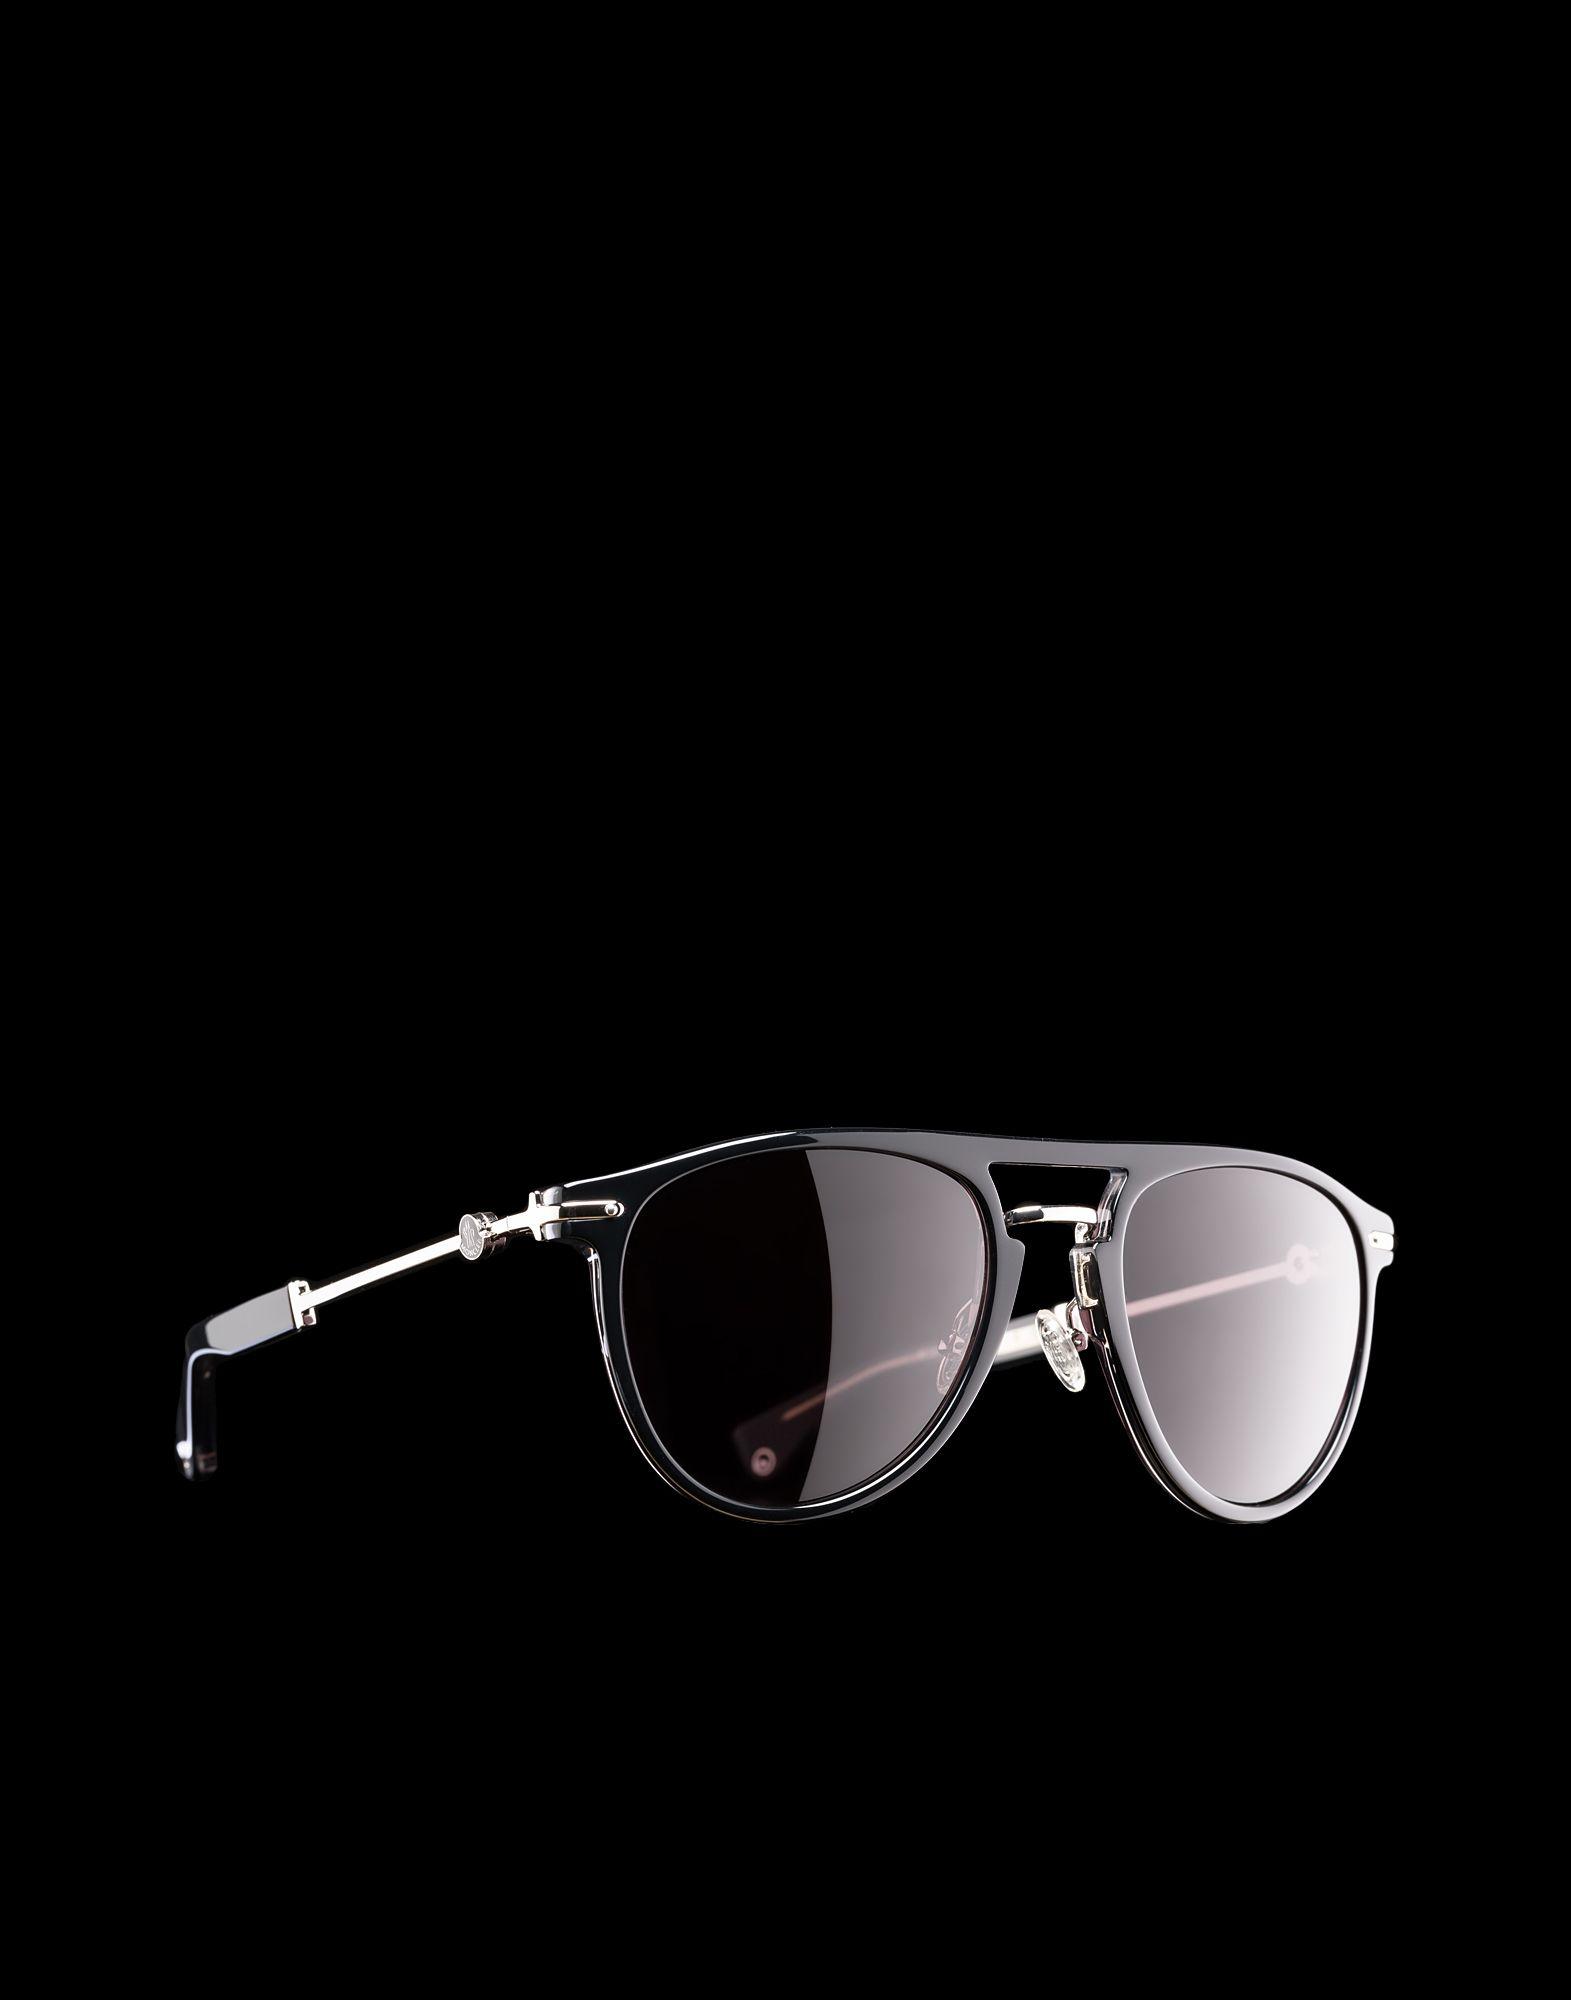 buy cheap glasses online  style glasses